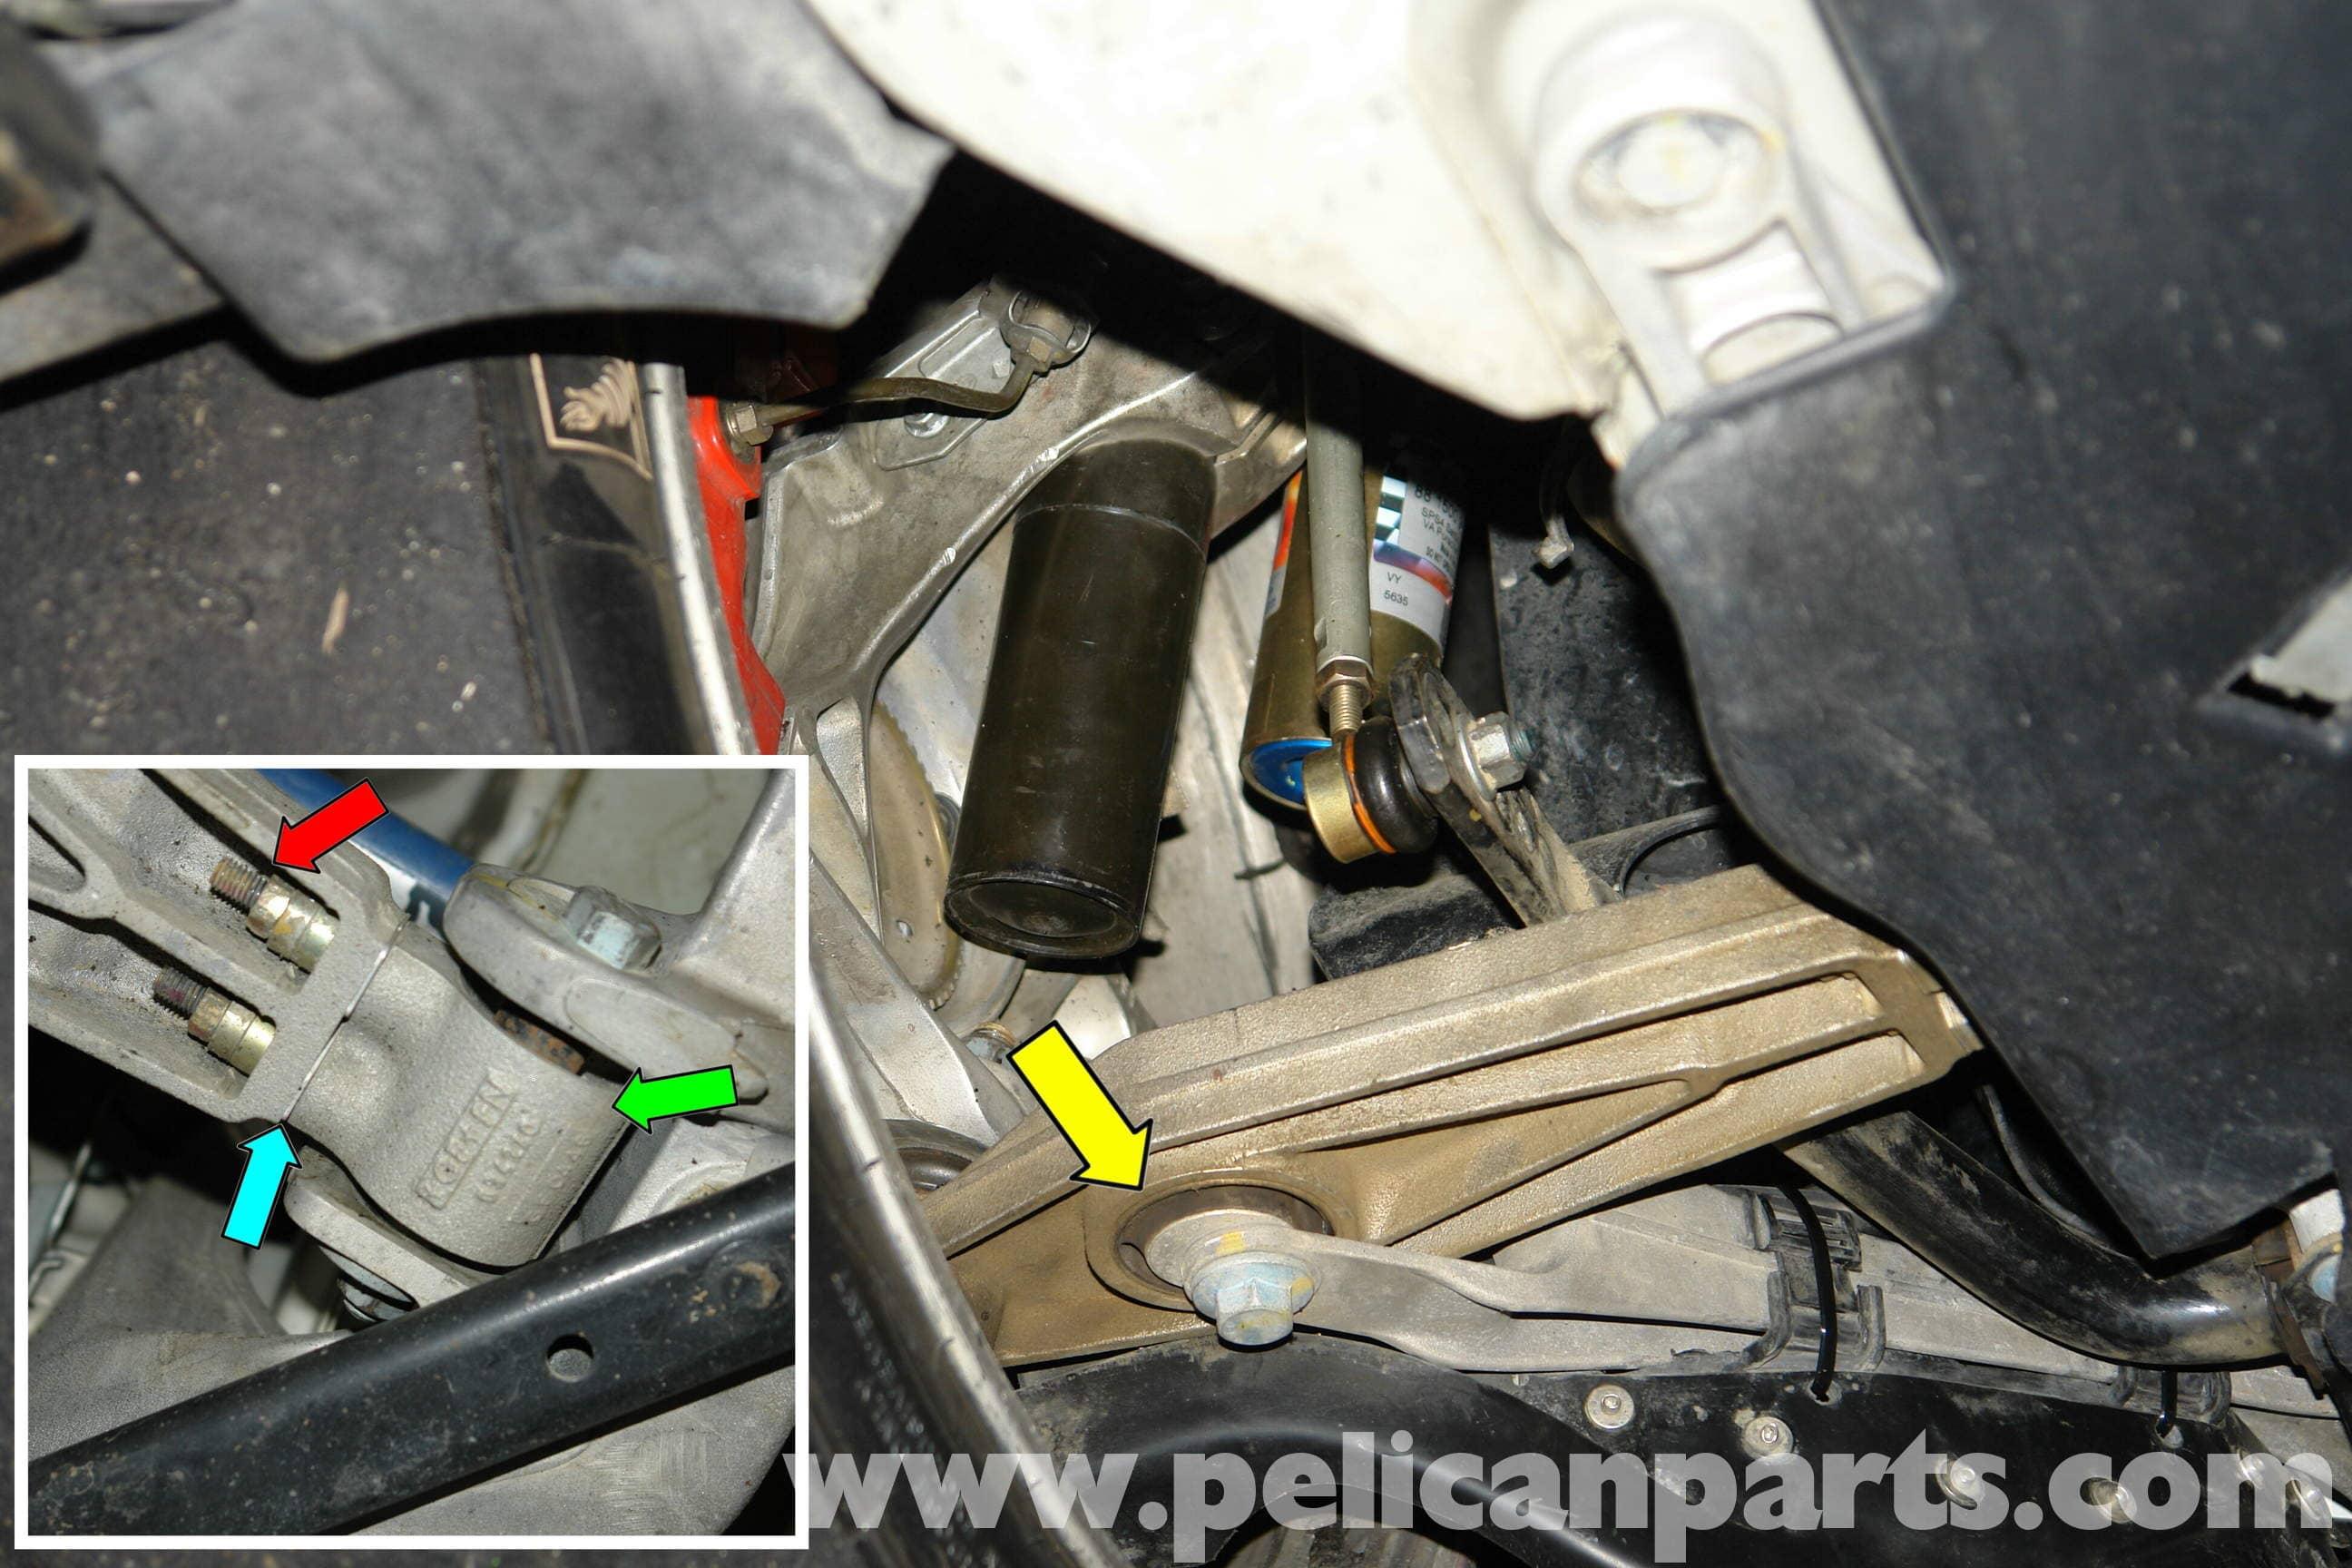 Porsche Boxster Alignment Principles 986 987 1997 08 Pelican 356 Wiring Diagram Large Image Extra